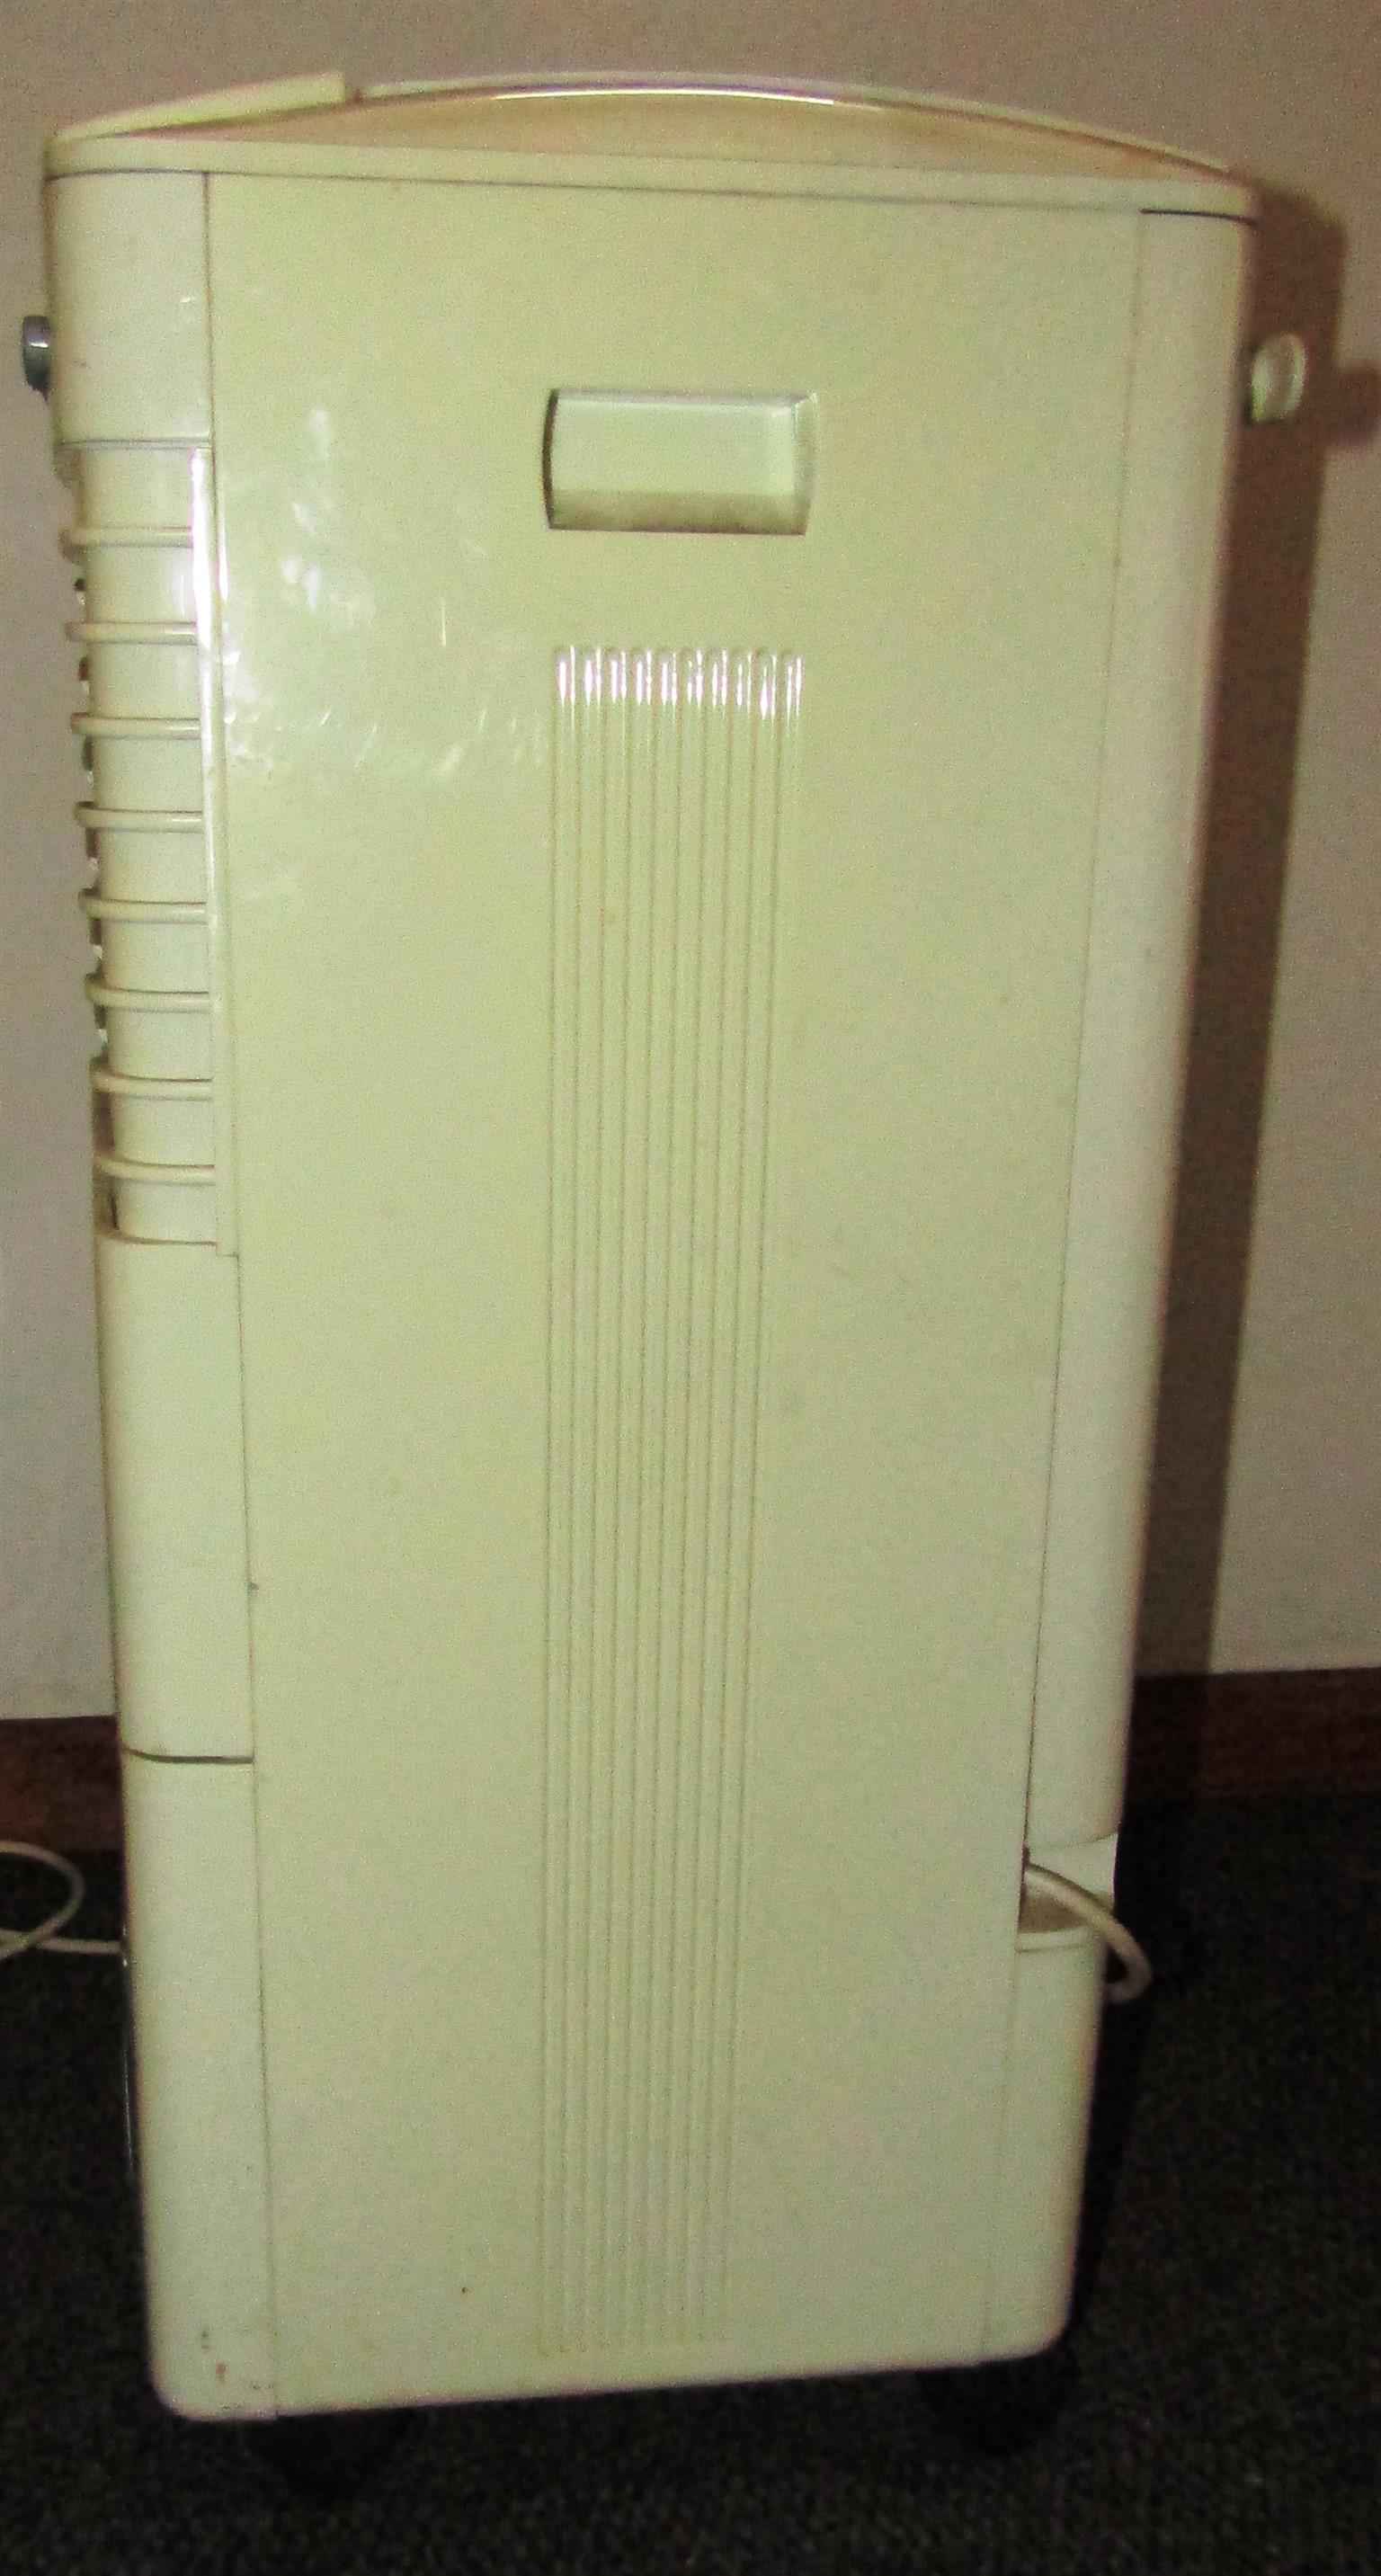 Westpoint Evaporative Cooler